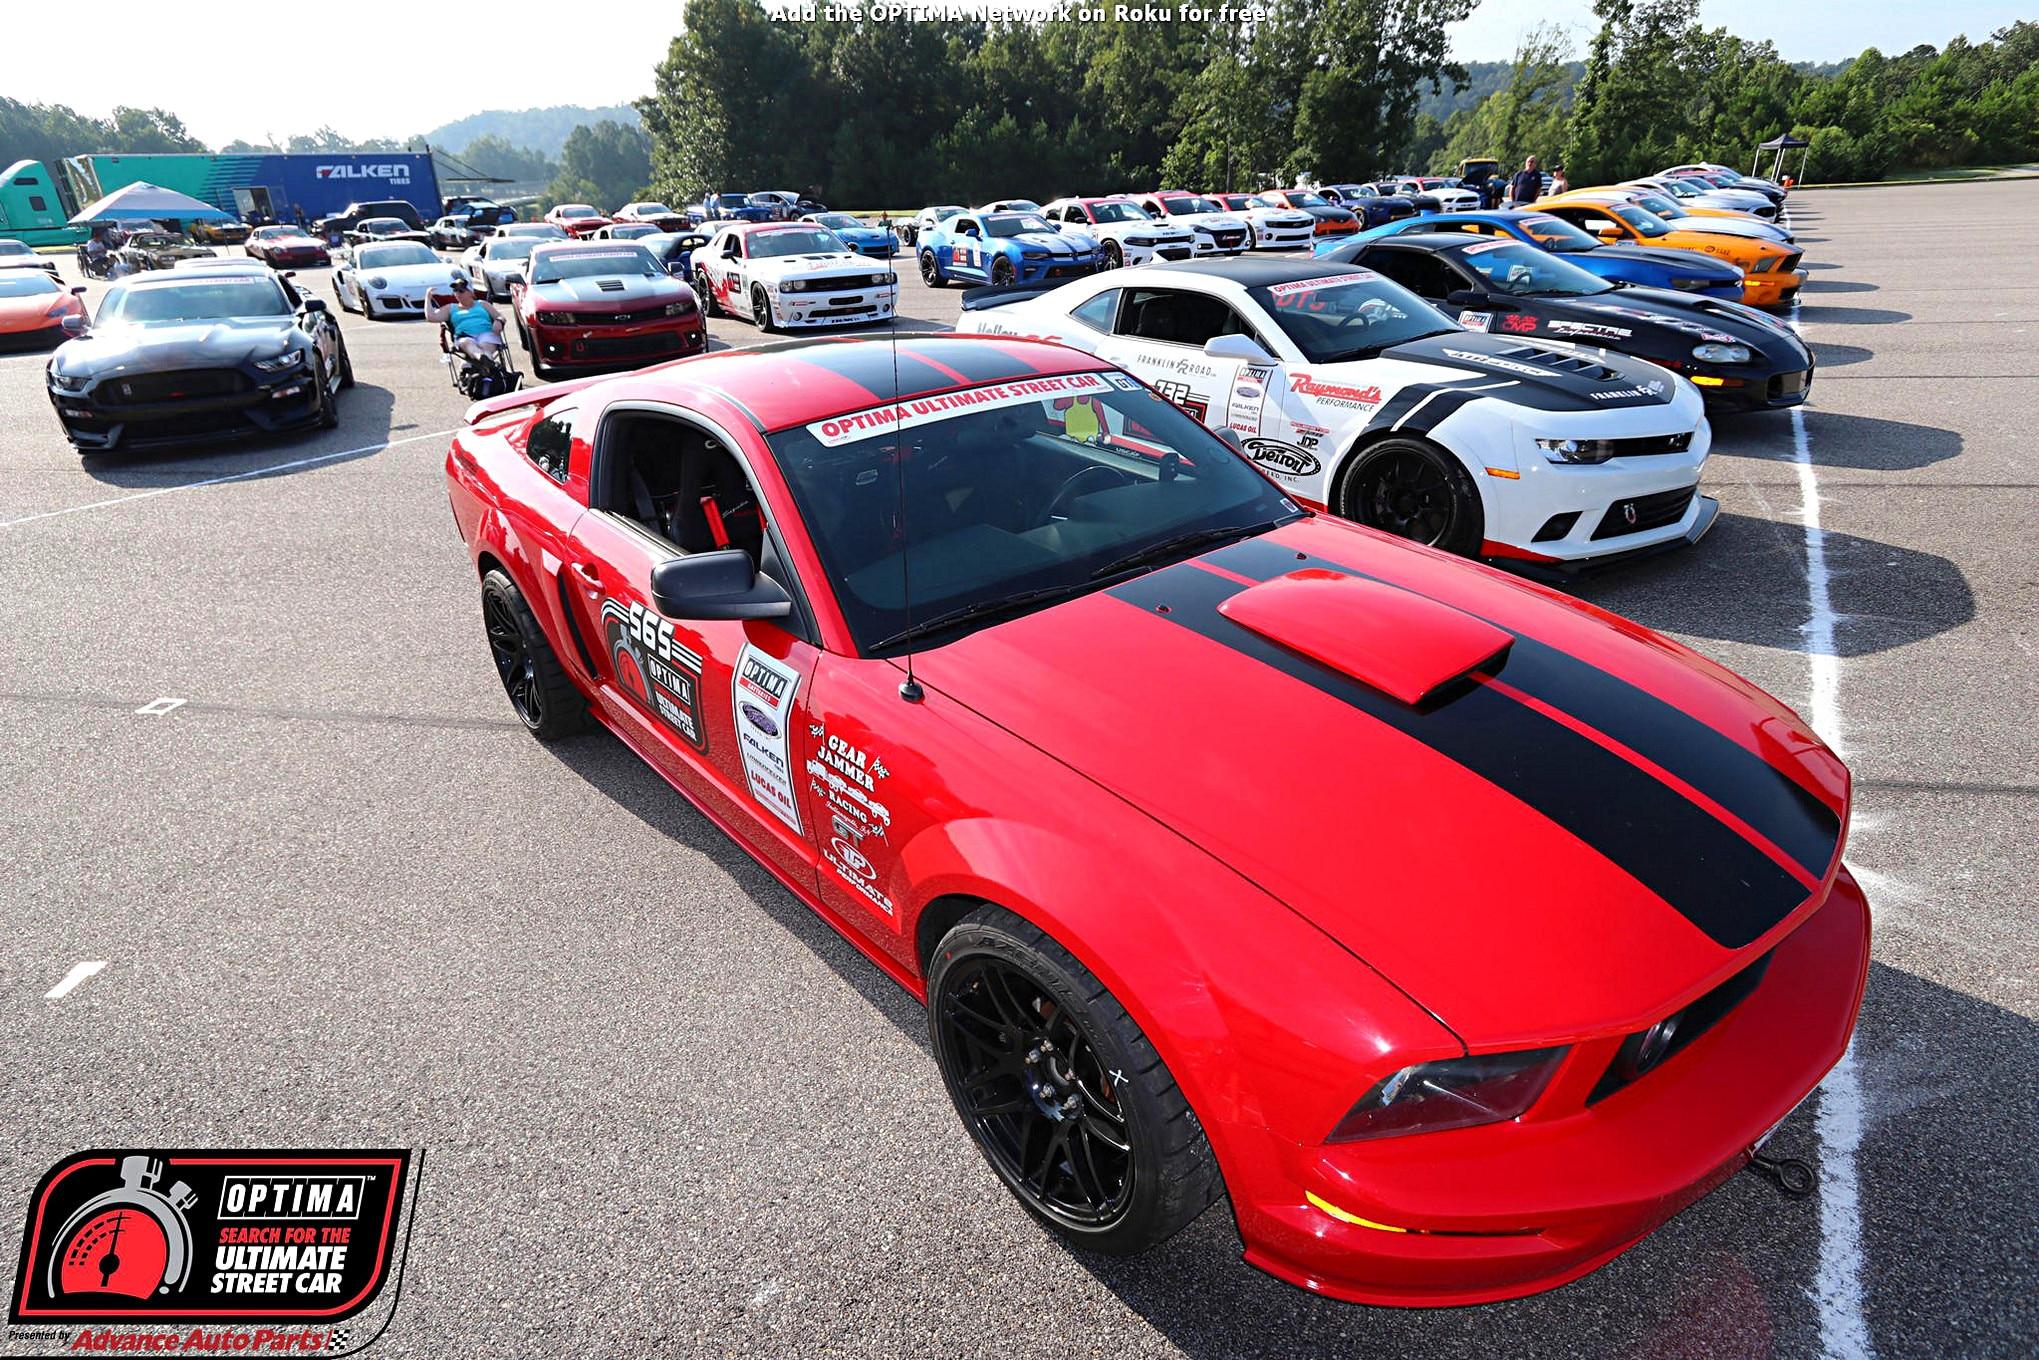 David Griffin 2006 Ford Mustang DriveOPTIMA Barber Motorsports Park 2018 4